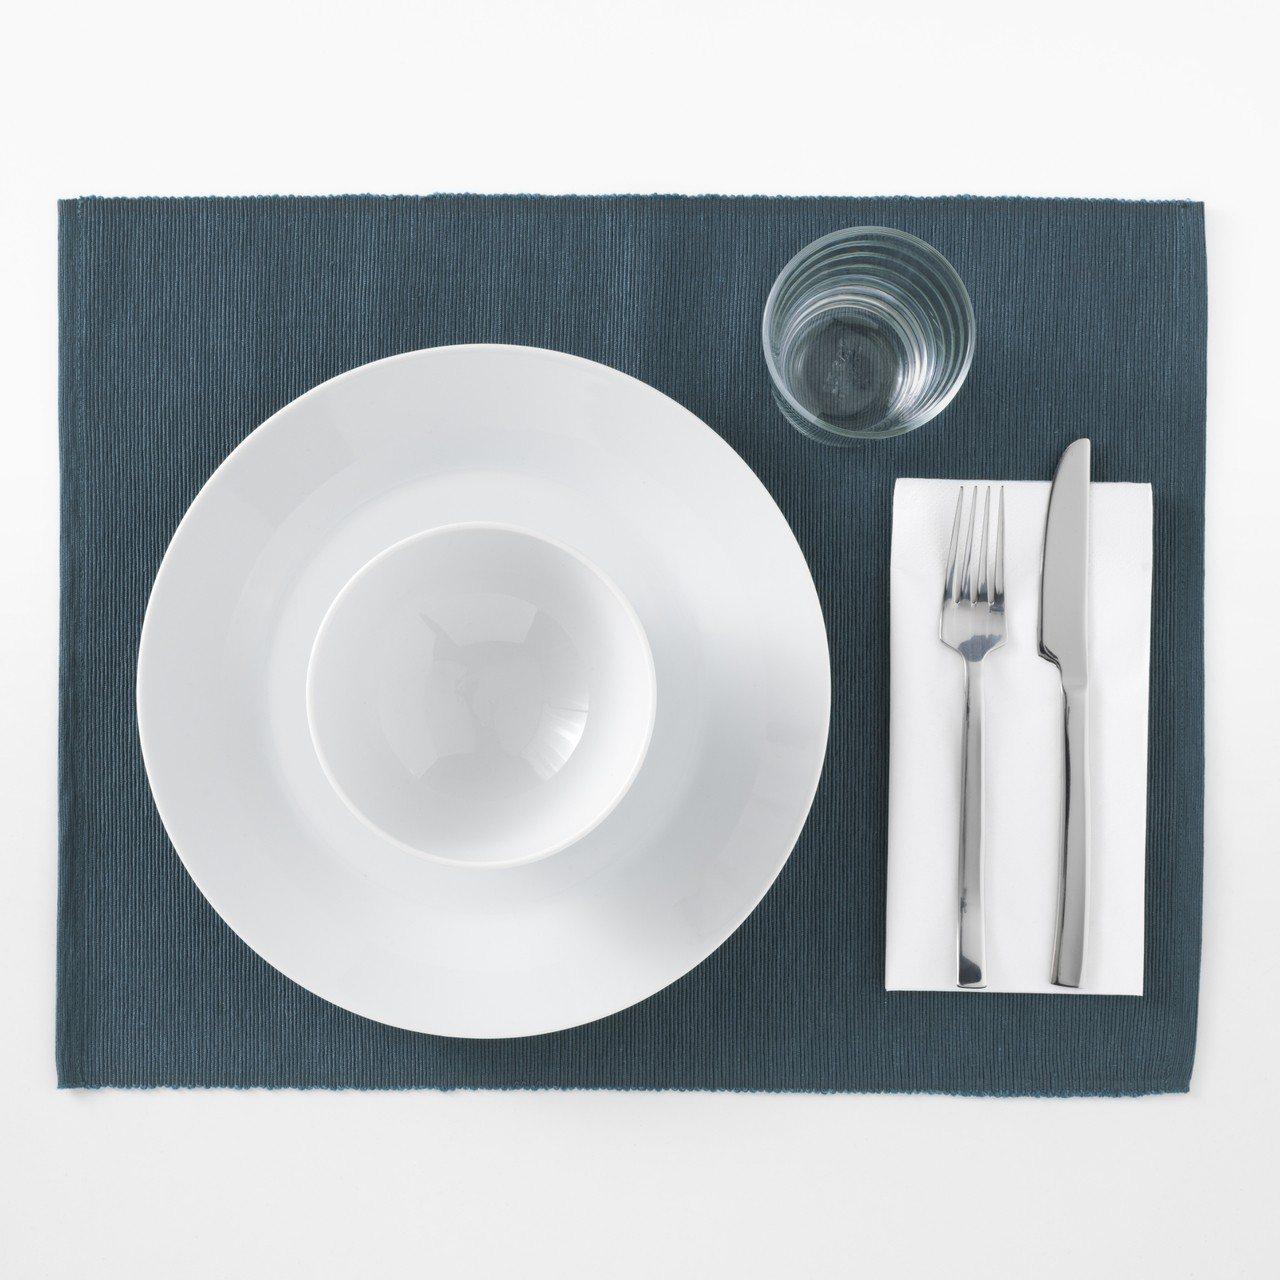 MARIT餐墊,原價59元、特價39元。圖/IKEA提供